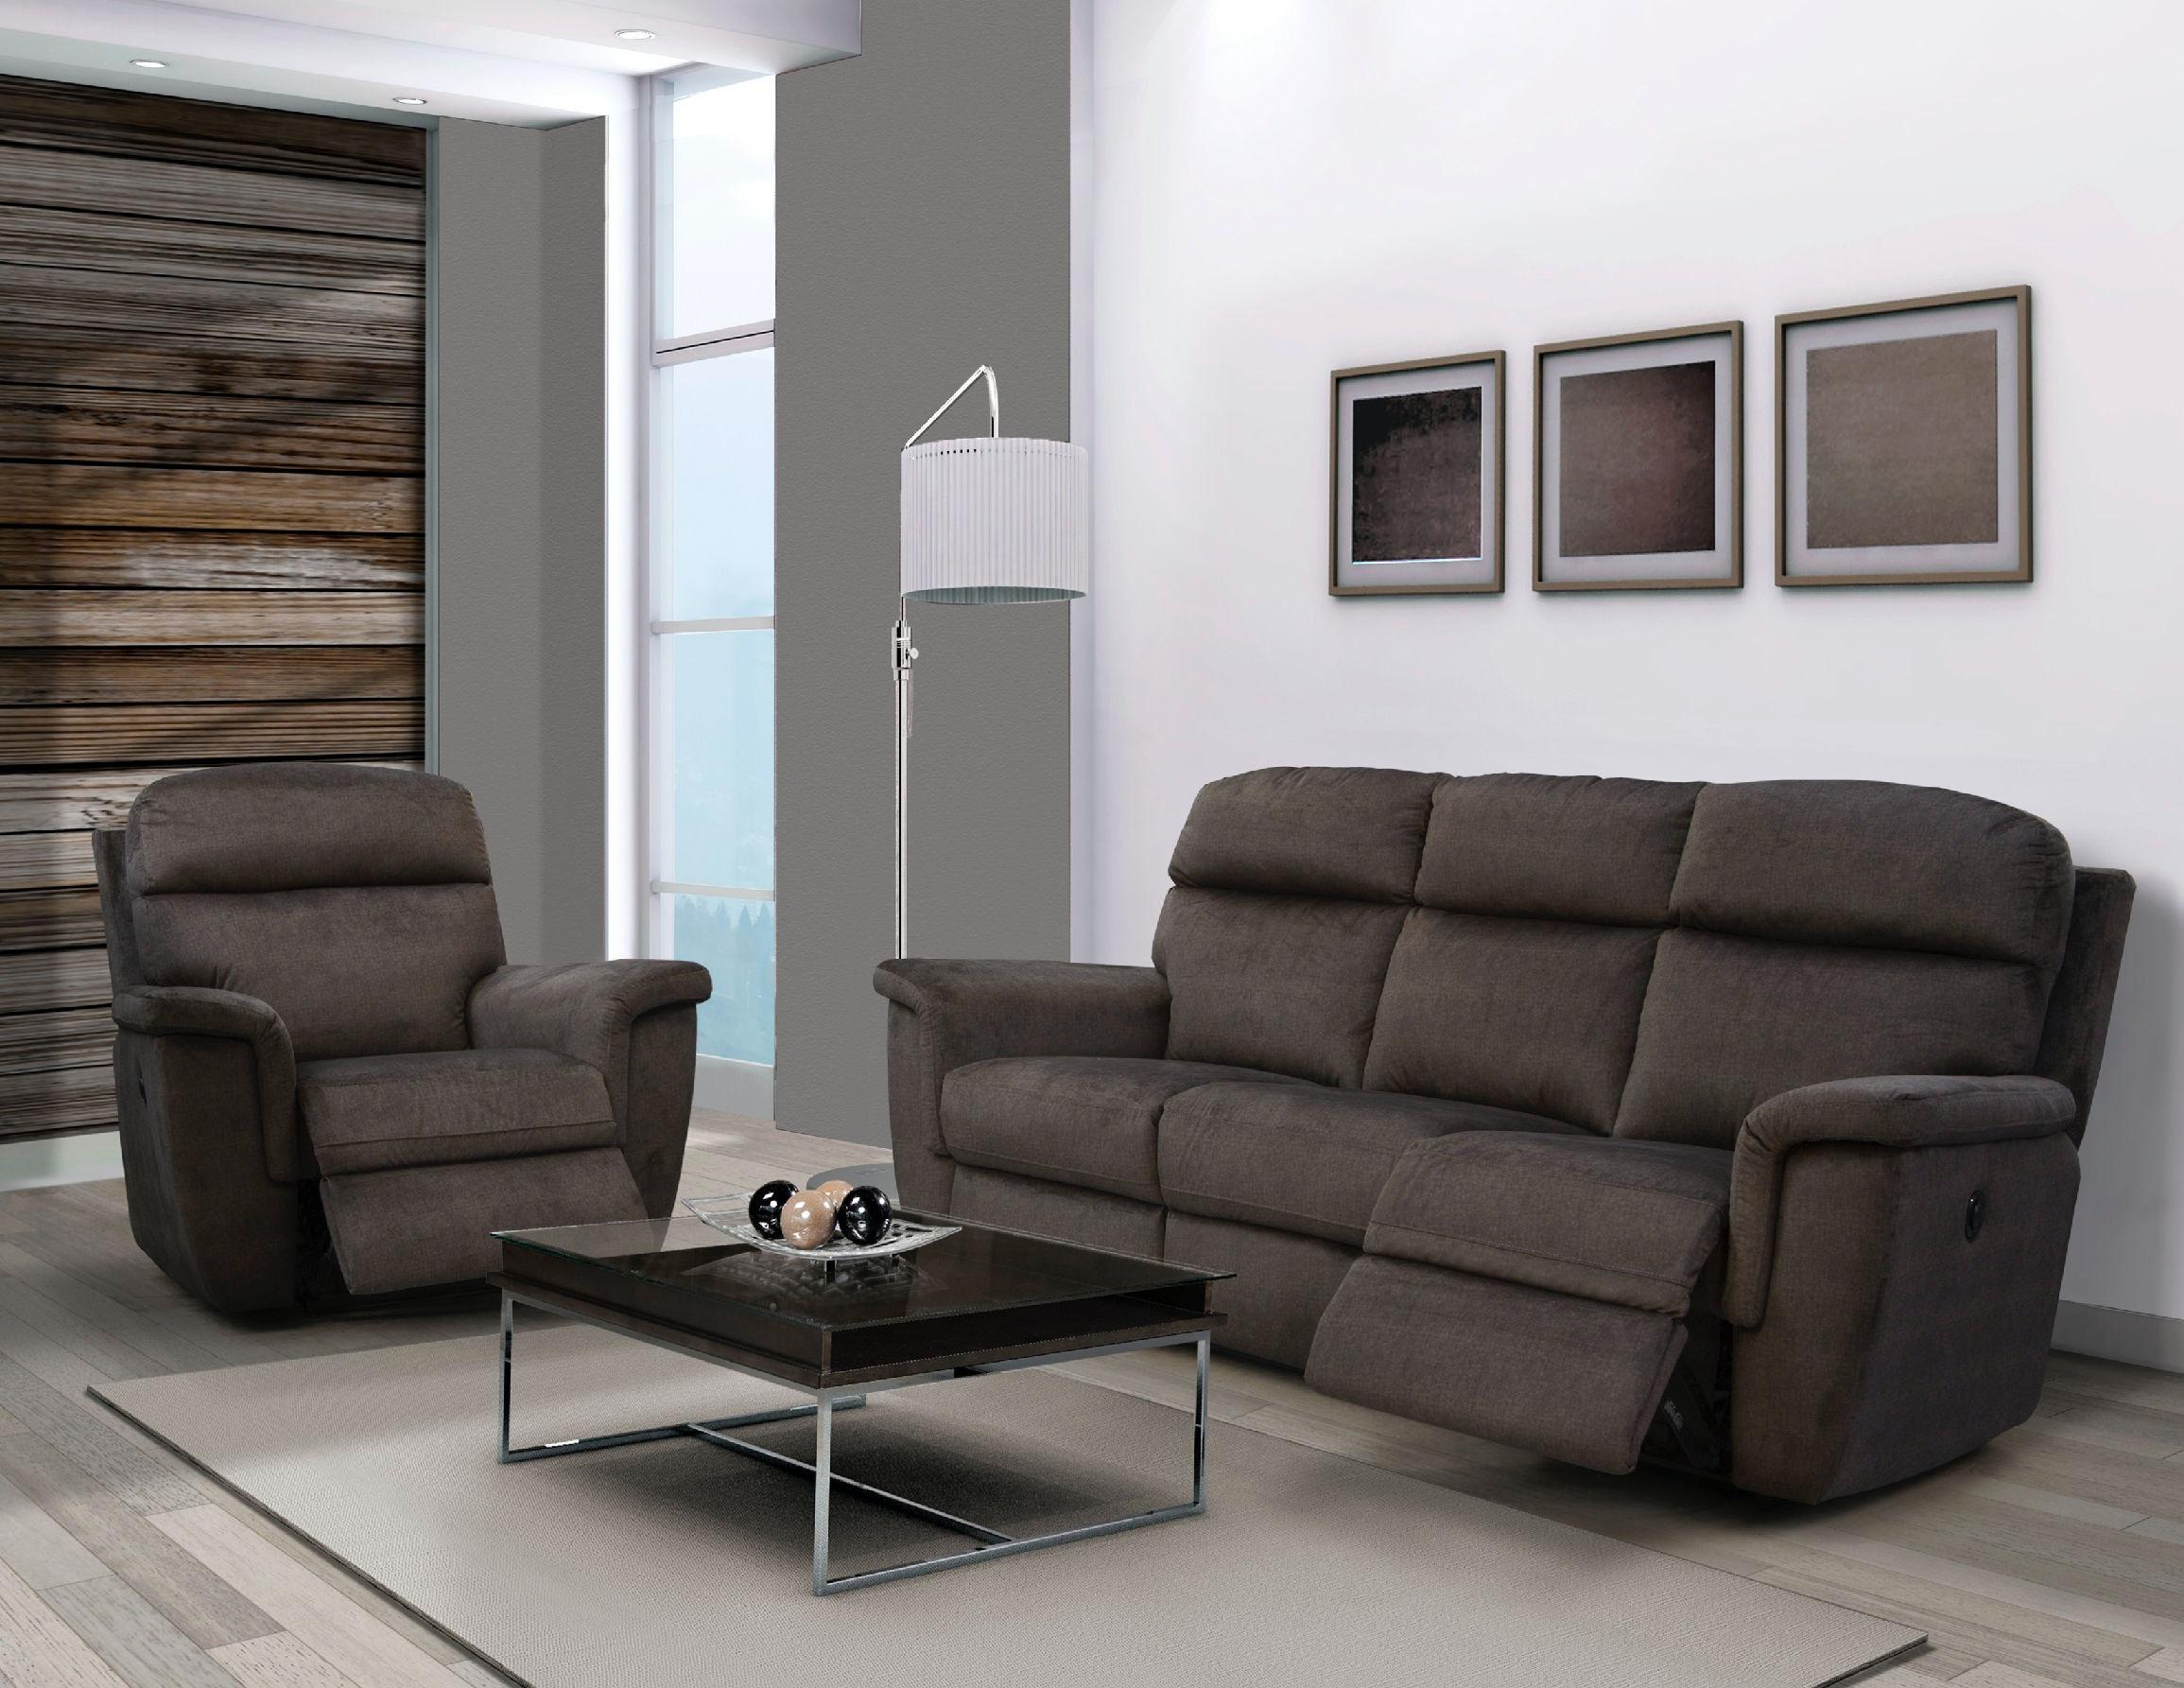 Elran Sofa W/Drawer   Power Pack ER40576 POWPu002607